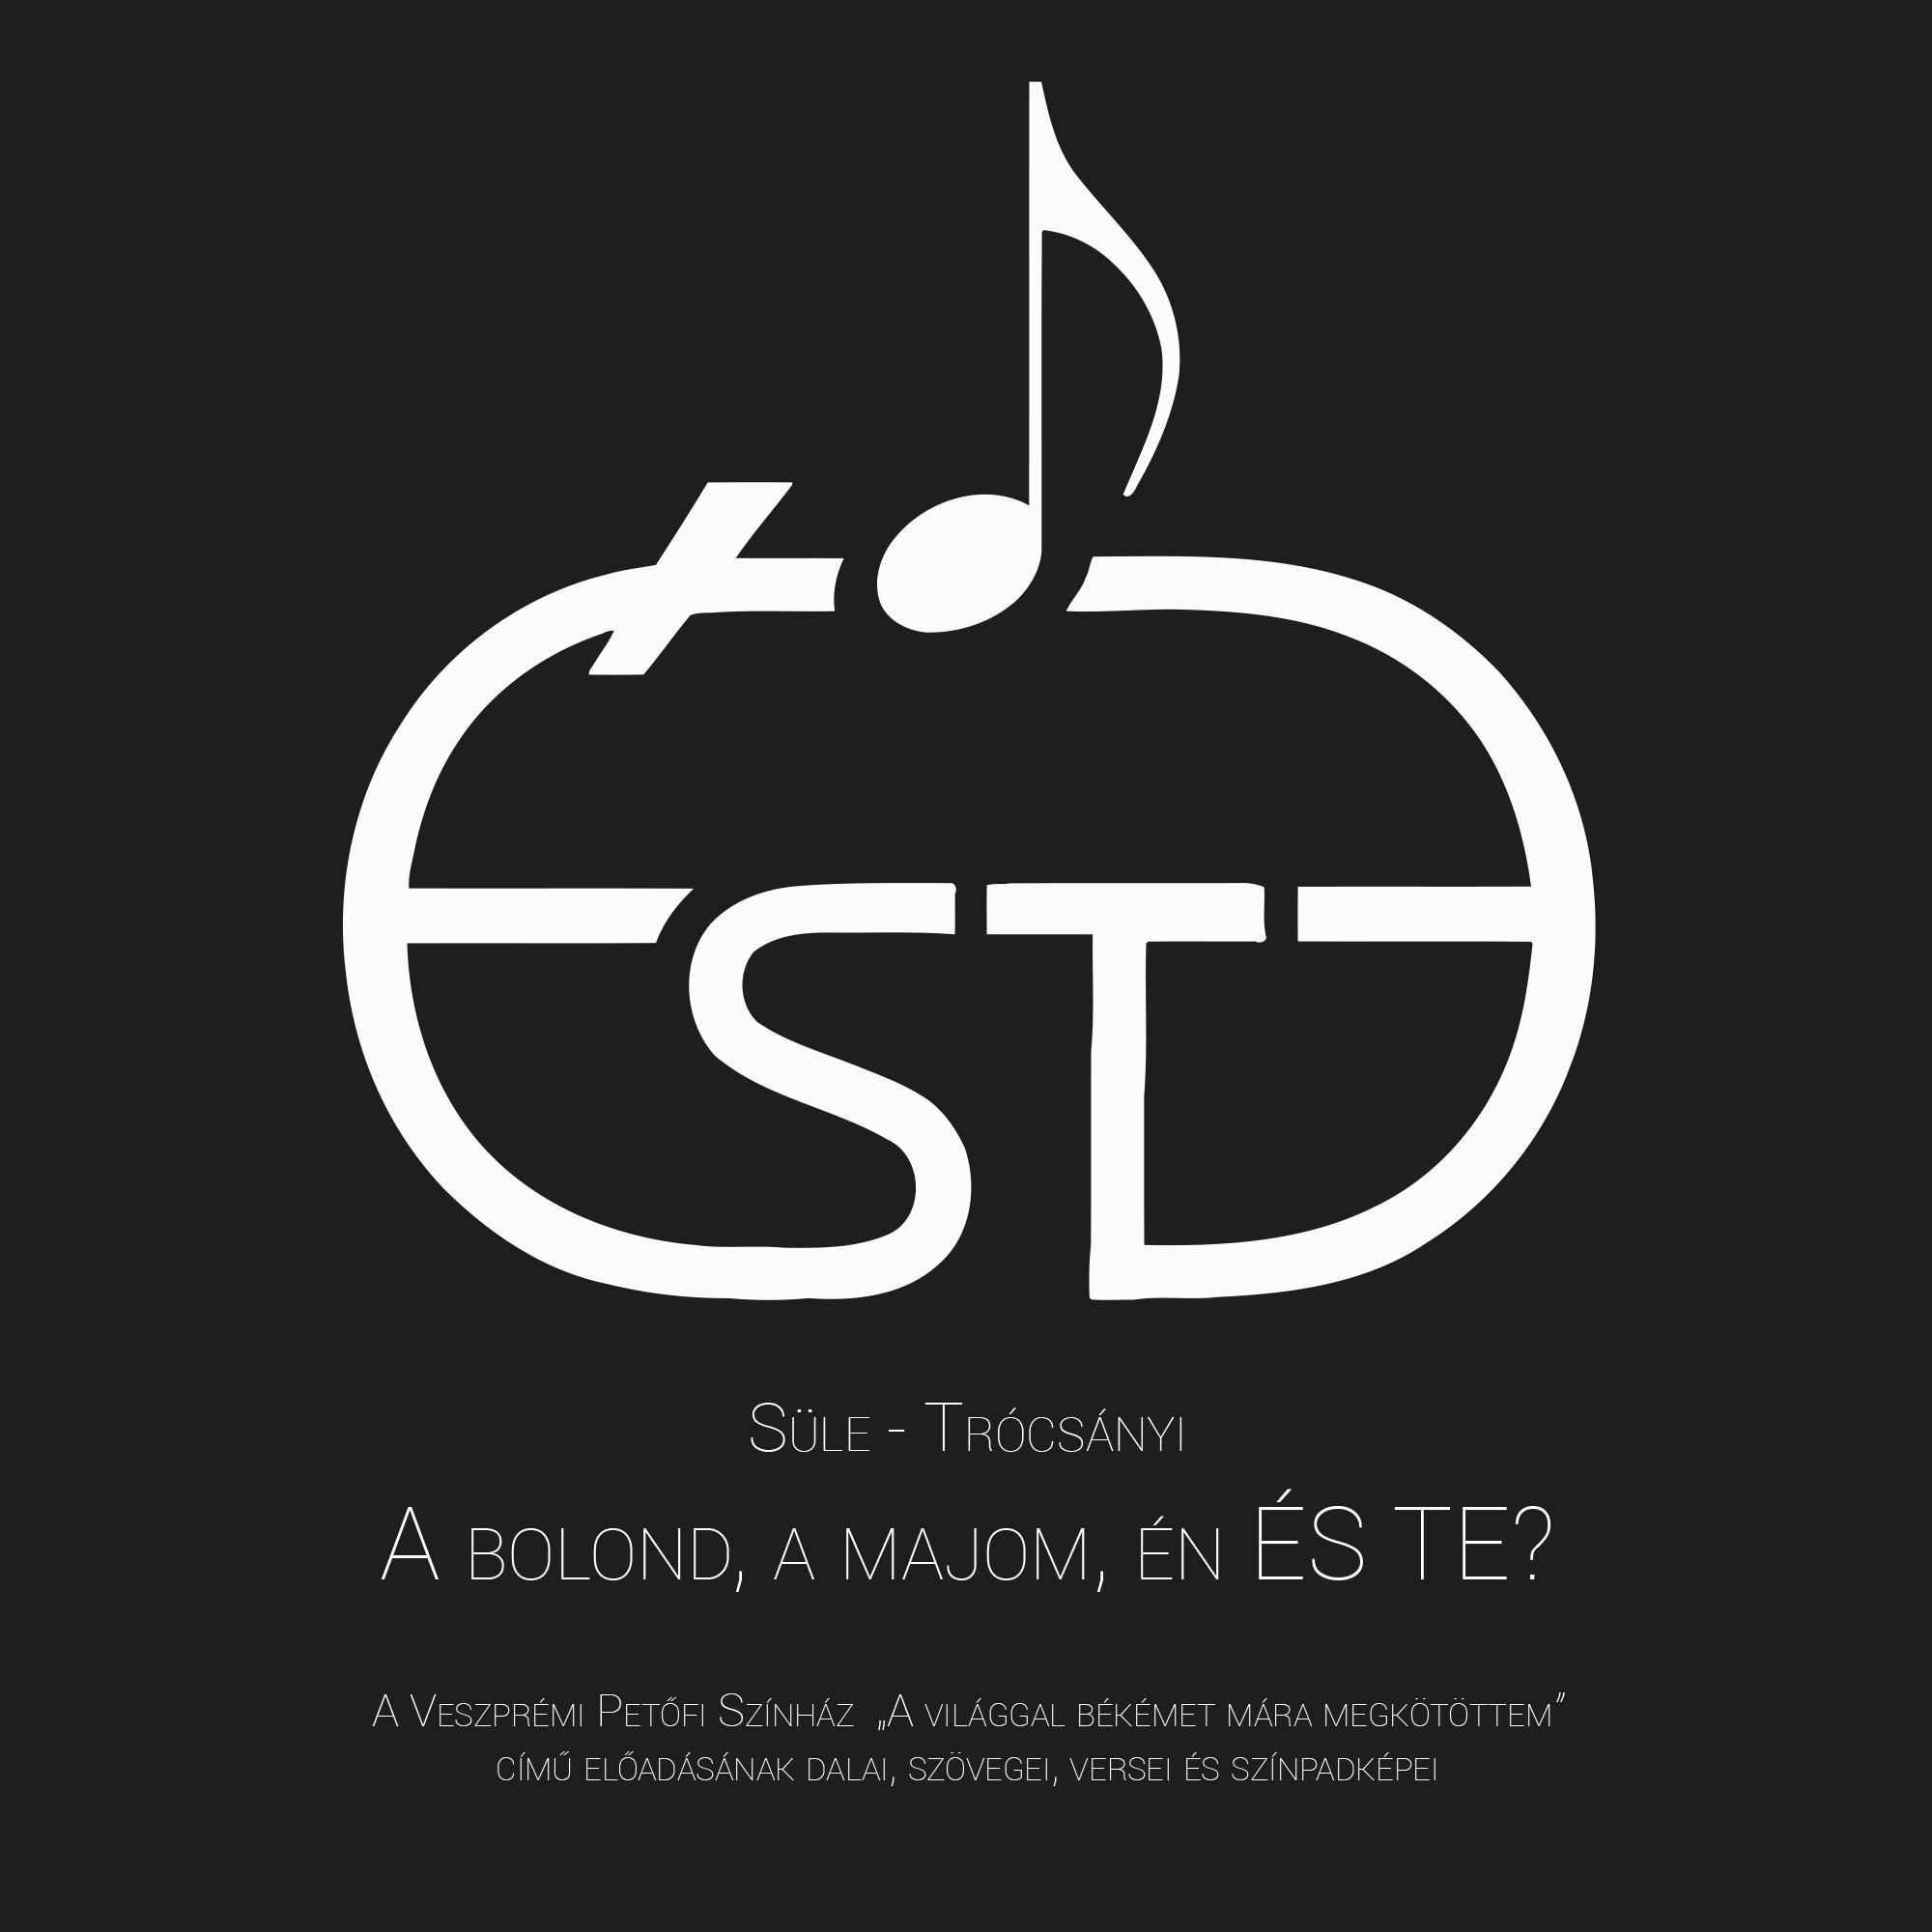 ÉSTE - A BOLOND, A MAJOM, ÉN ÉS TE? - CD -